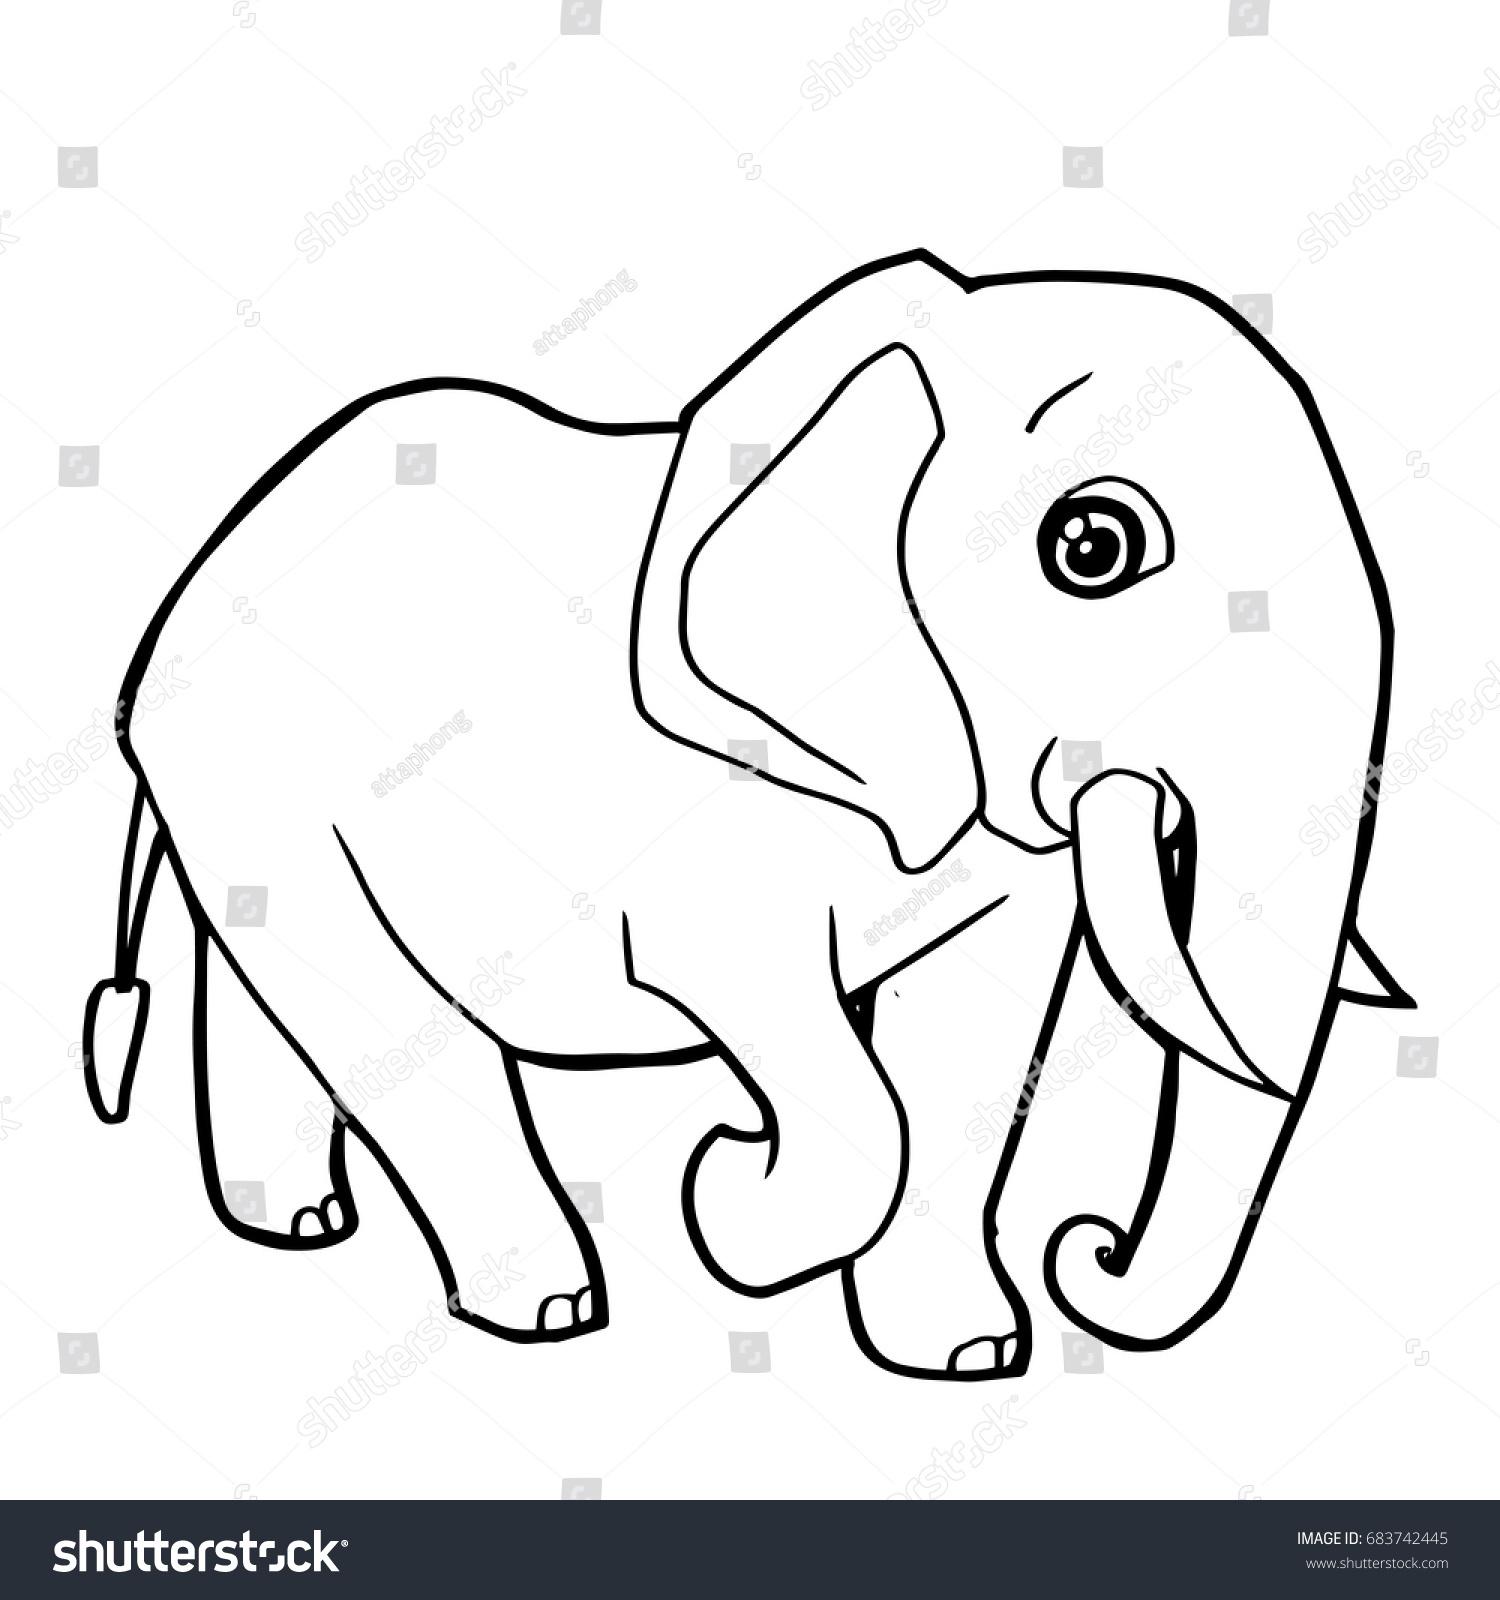 Cartoon Cute Elephant Coloring Page Vector Stock Vector Royalty